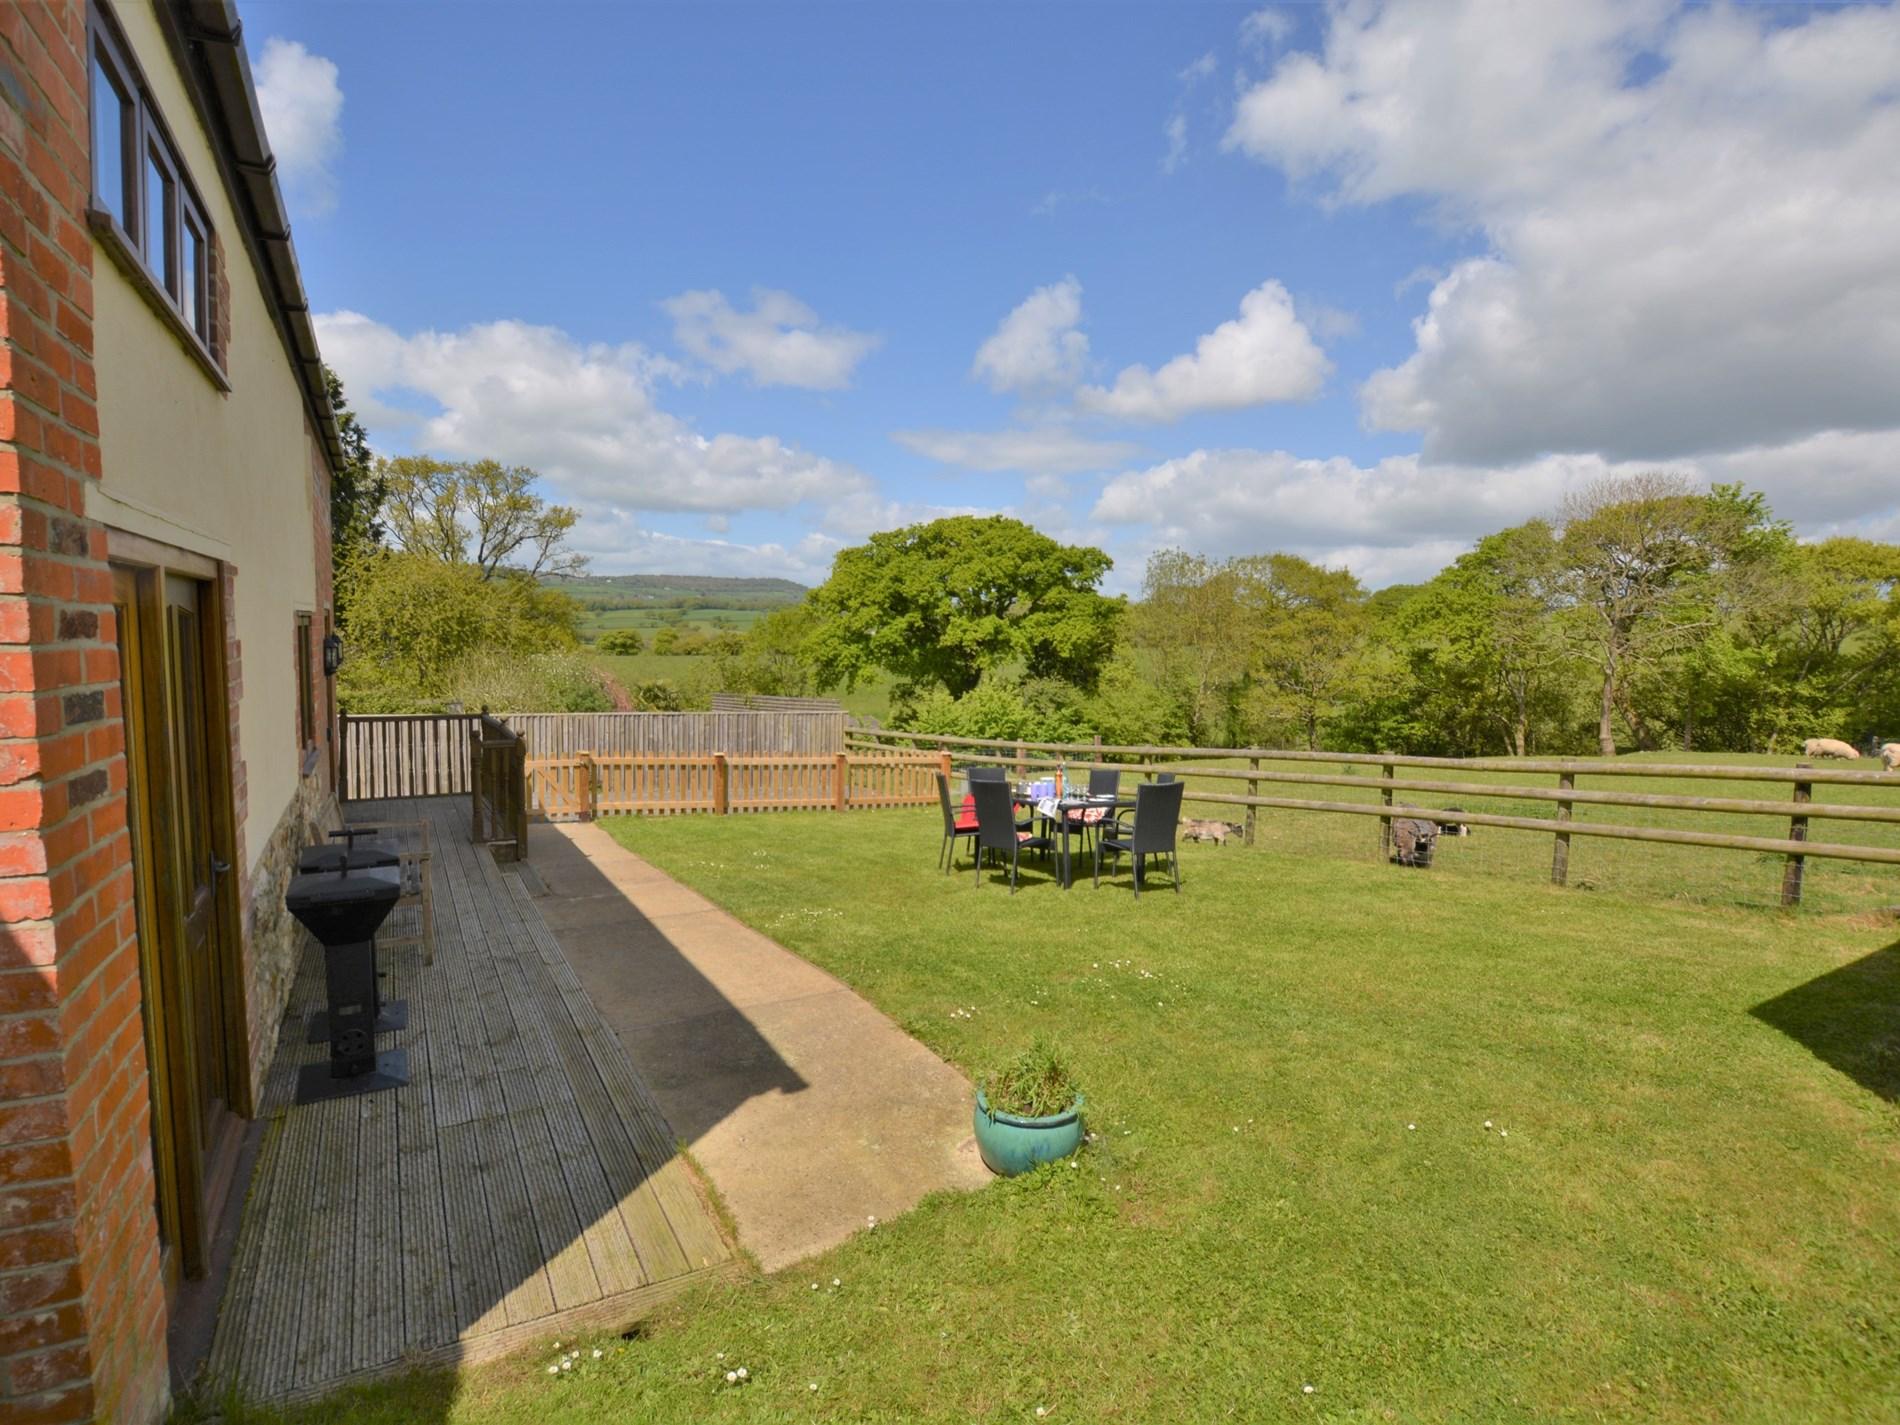 3 Bedroom Cottage in Bridport, Dorset and Somerset